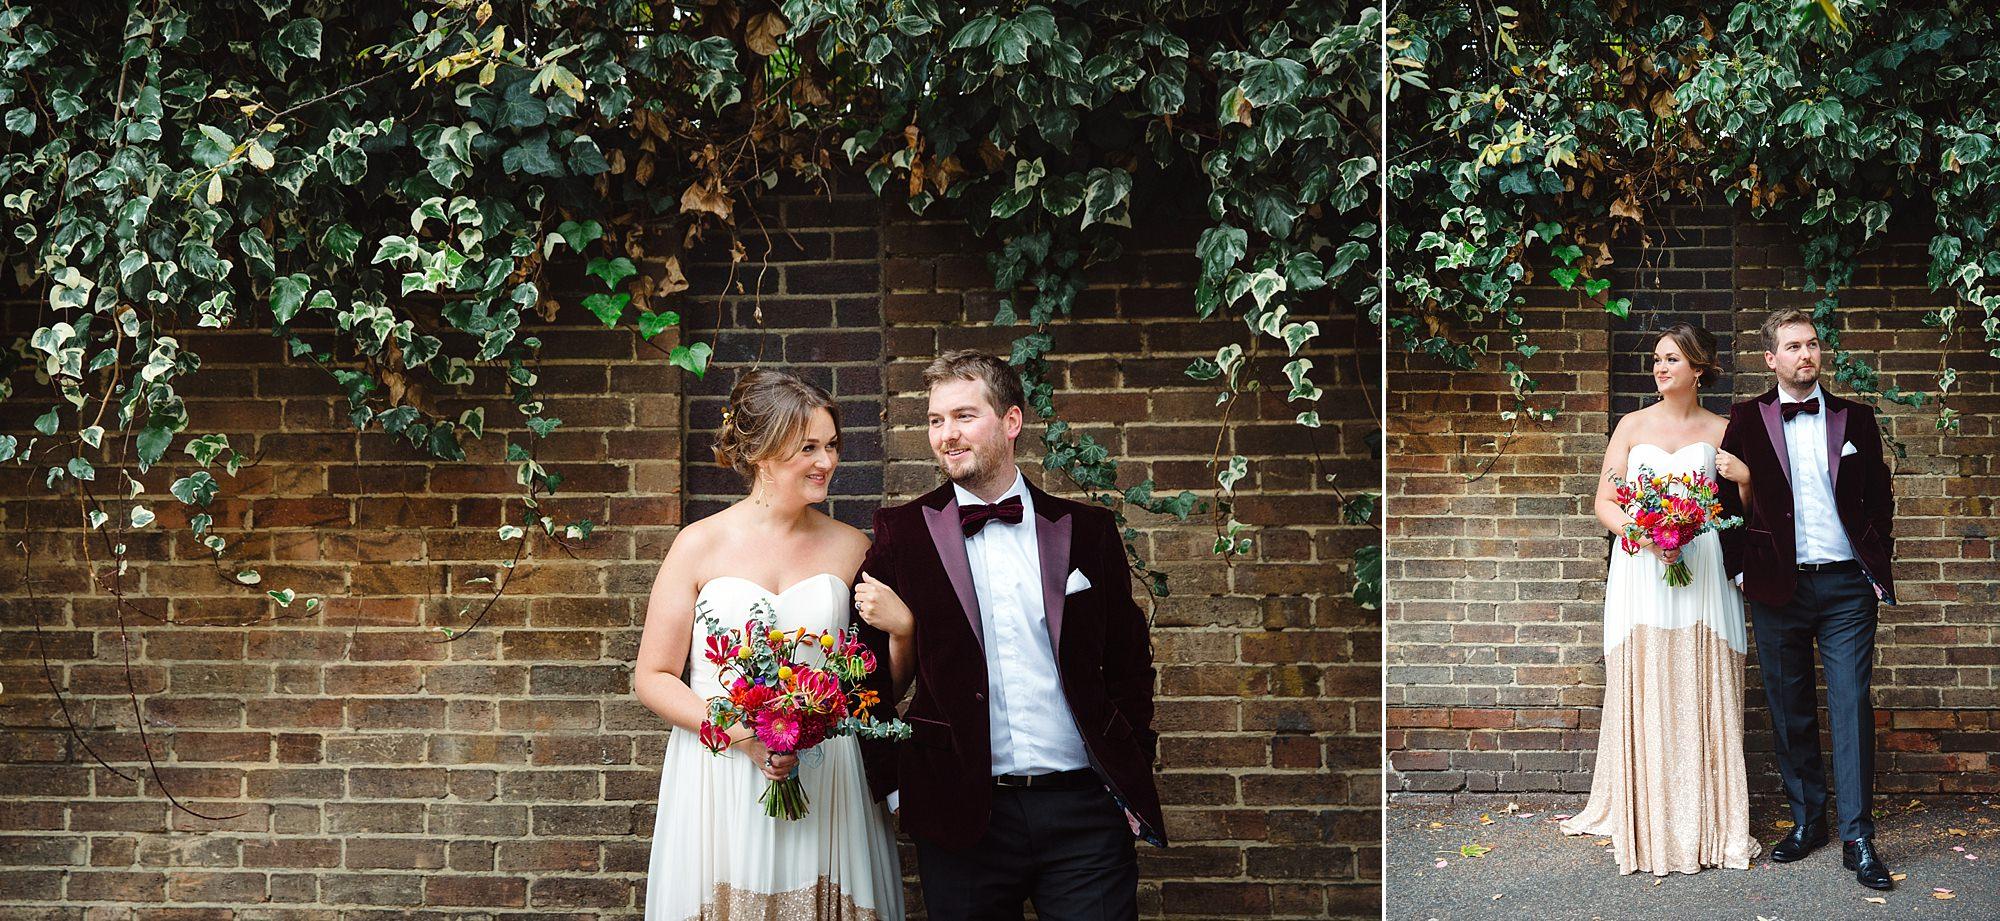 Fun London Wedding bride and groom wedding portraits in brixton